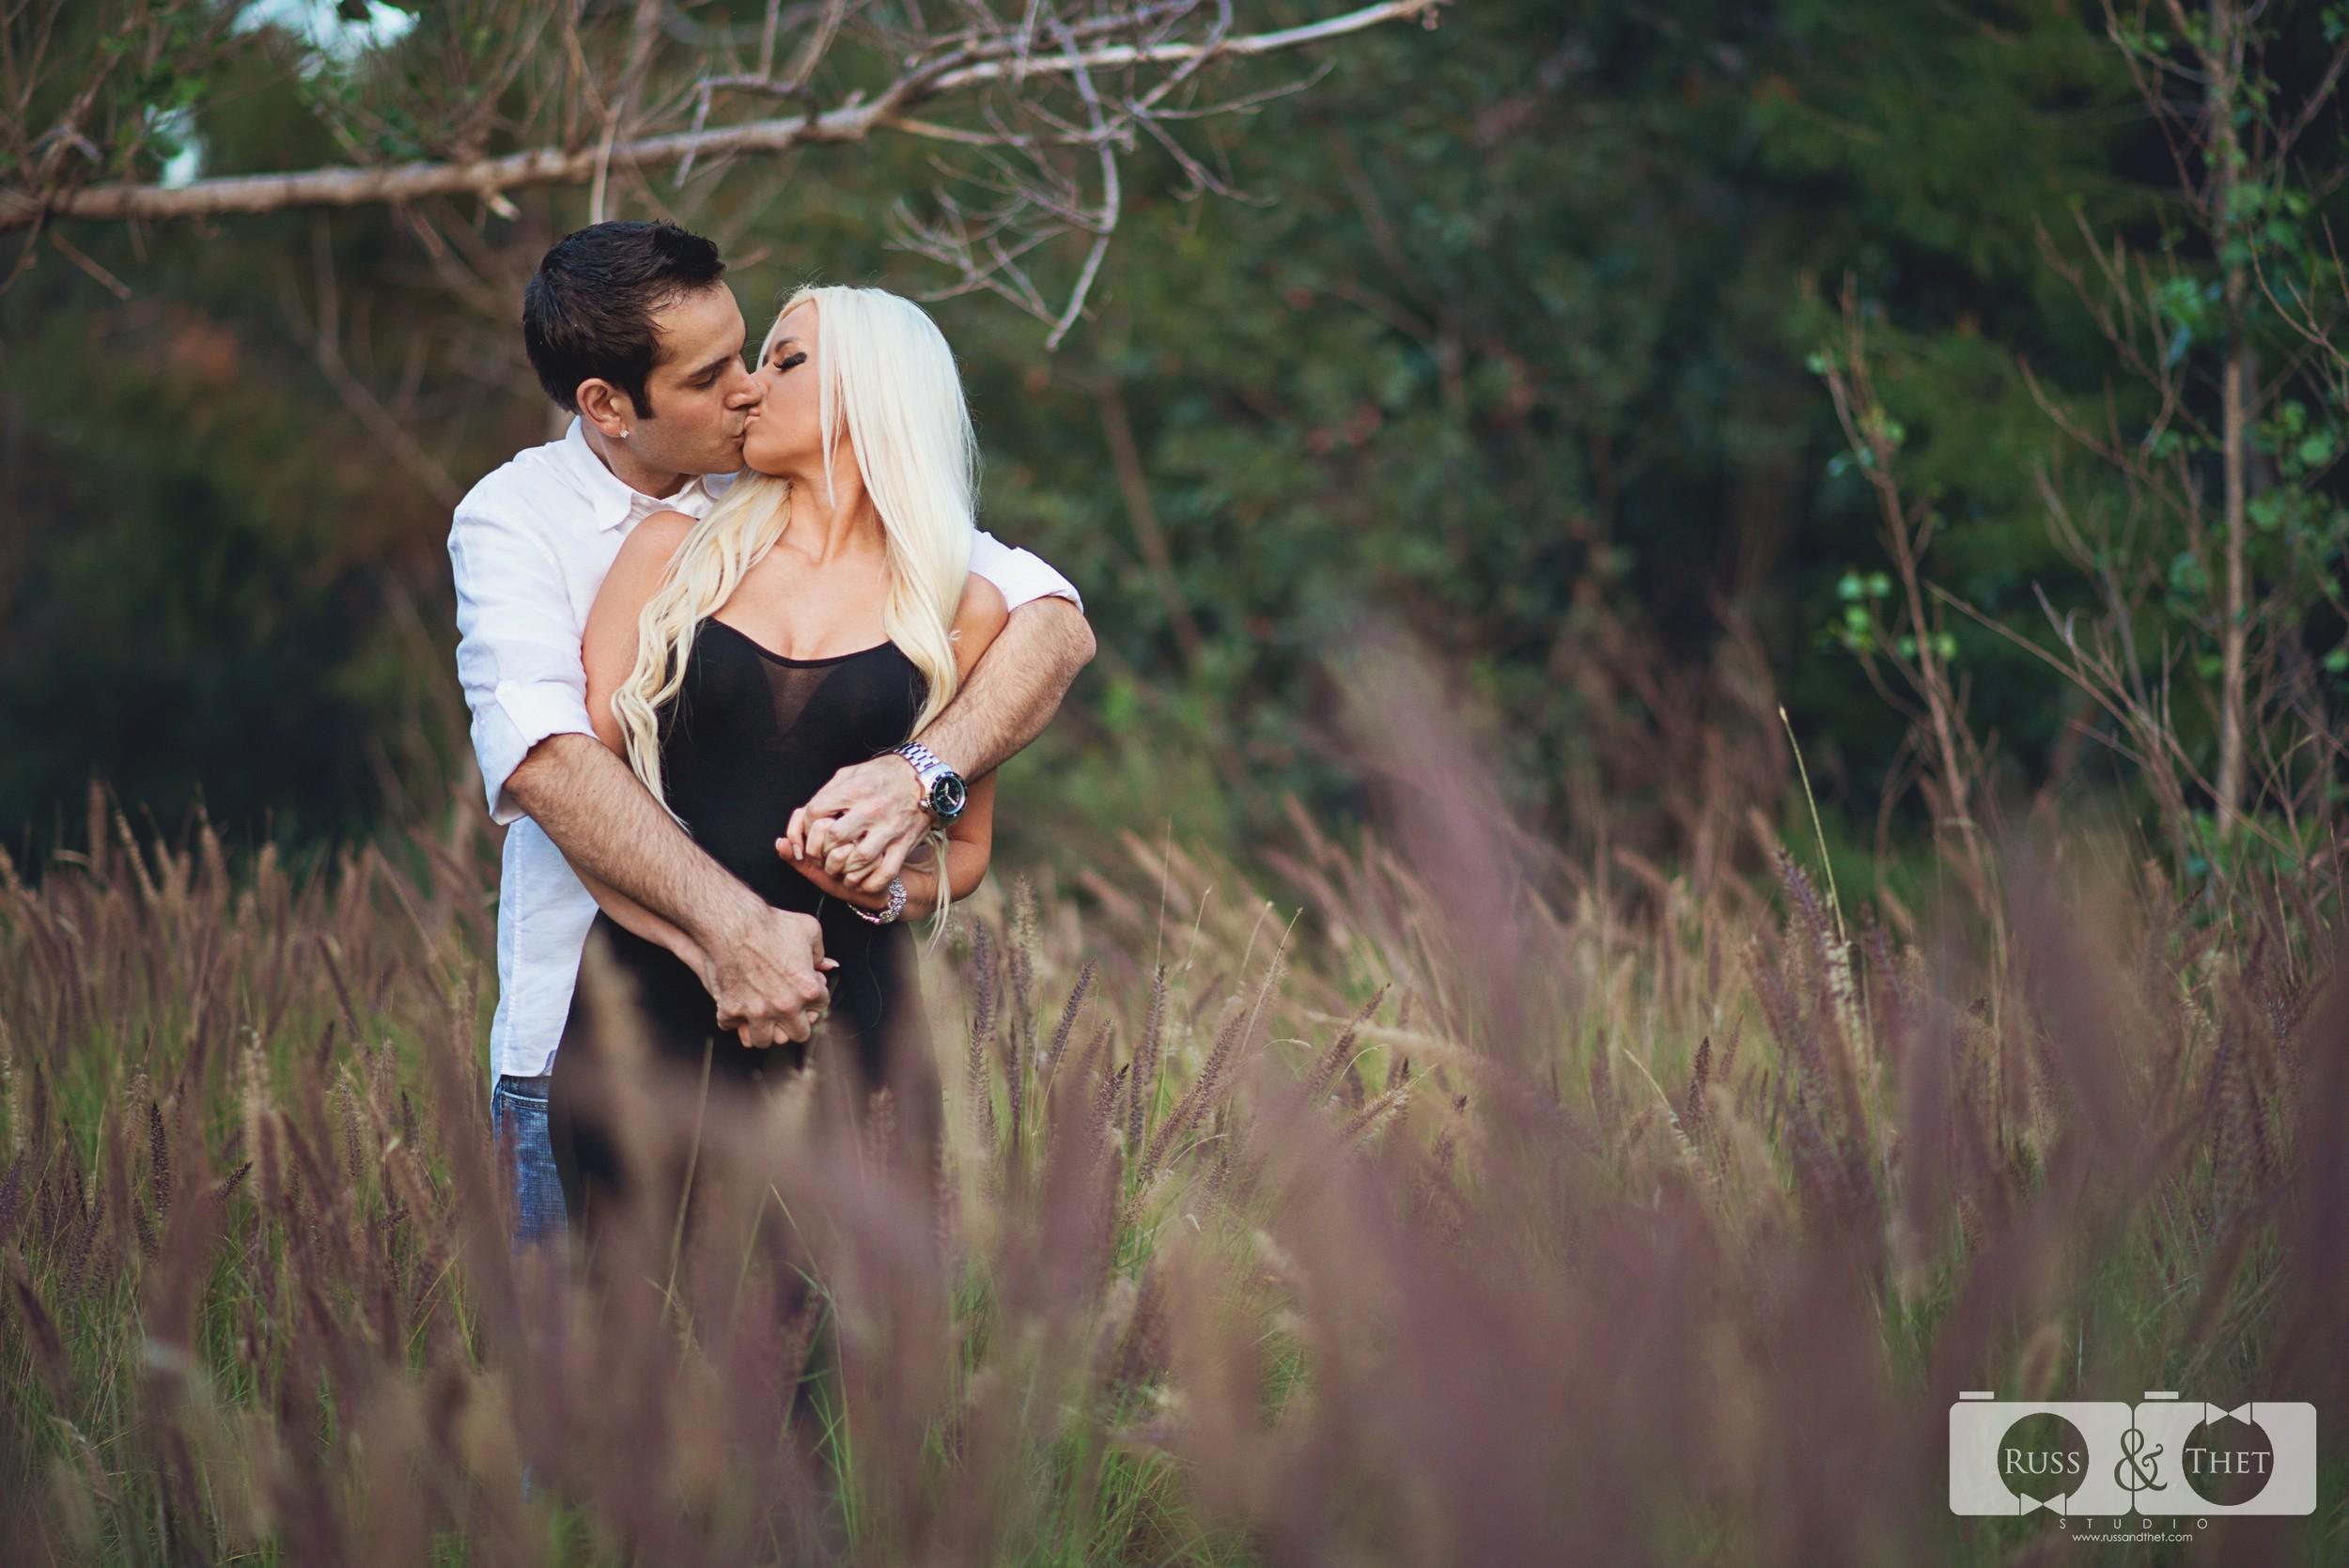 Jon&Kimee-Orange-County-Engagement-Photographer (8).jpg